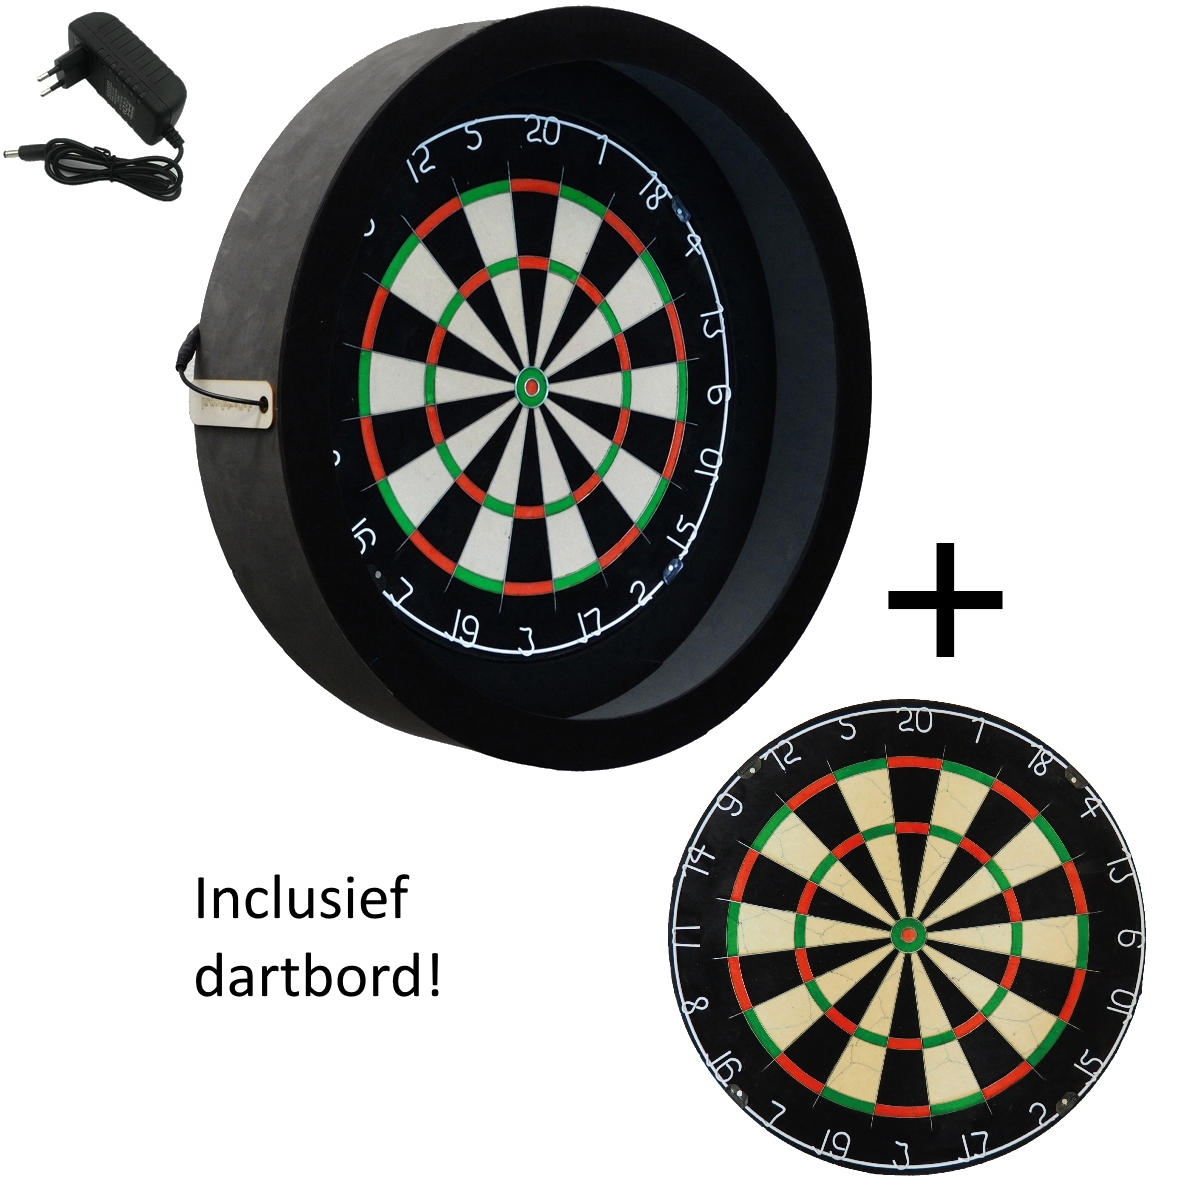 sorpresa pro dartbord verlichting inclusief a merk top dartbord zwart